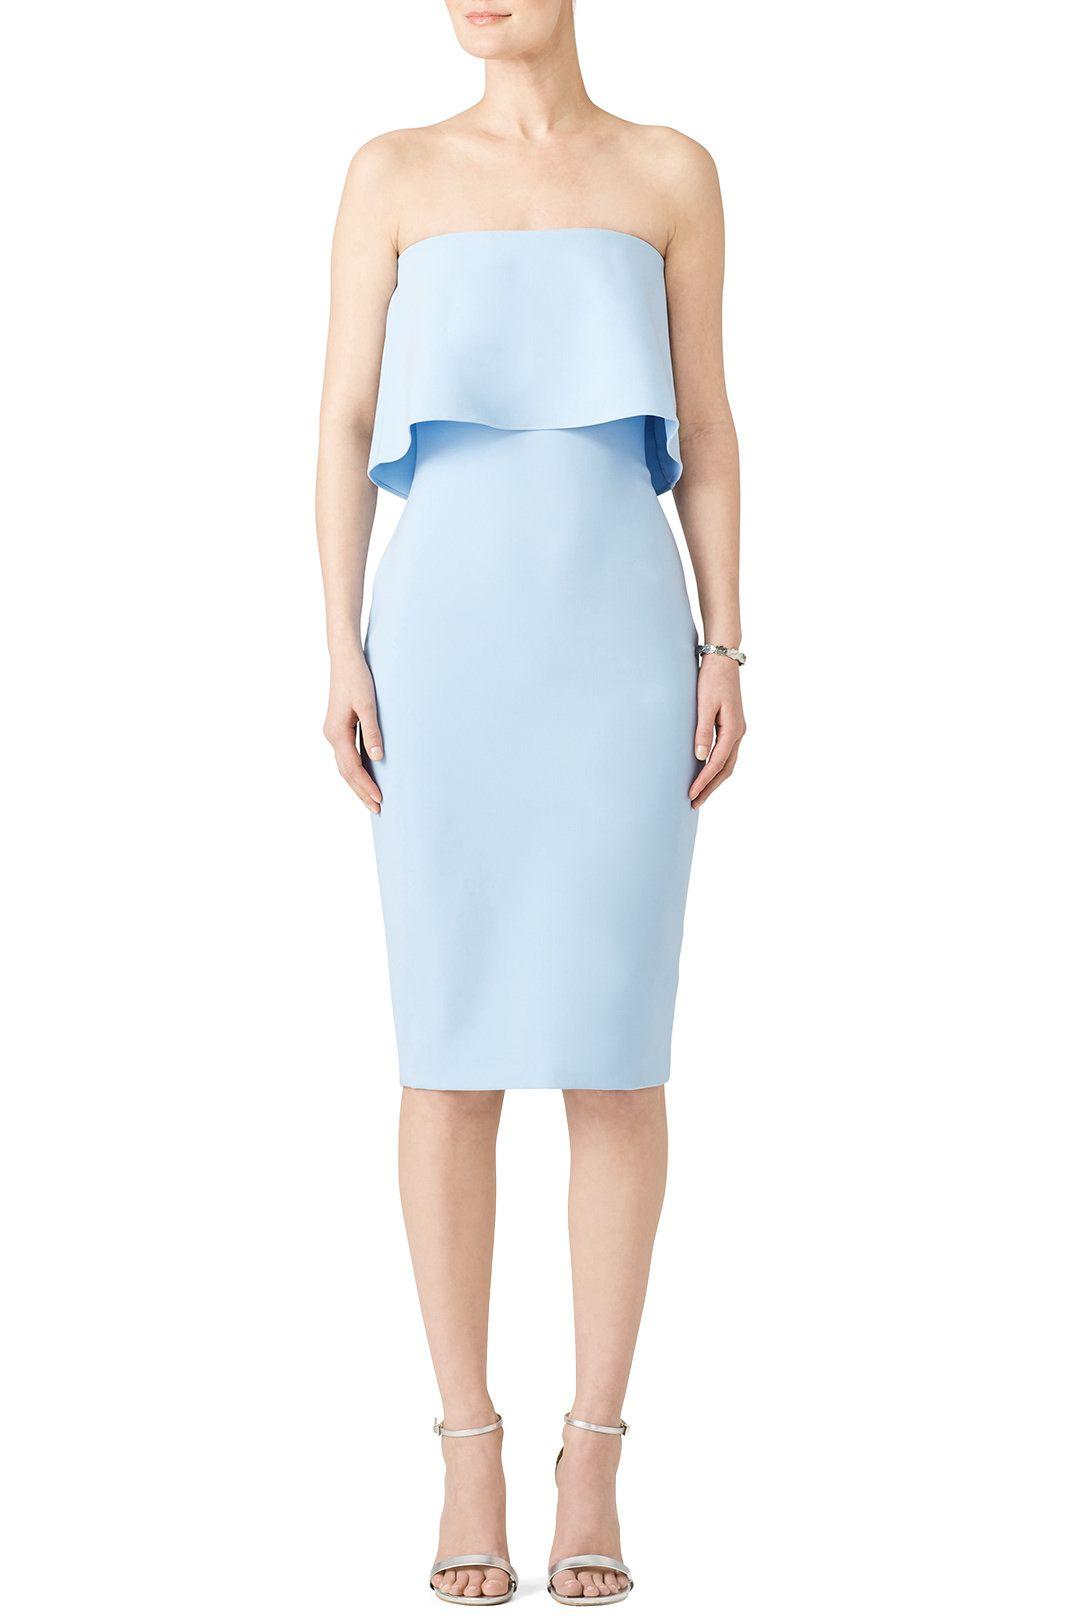 Likely Light Blue Driggs Dress Blue Wedding Guest Dresses Light Blue Dresses Dresses [ 1620 x 1080 Pixel ]